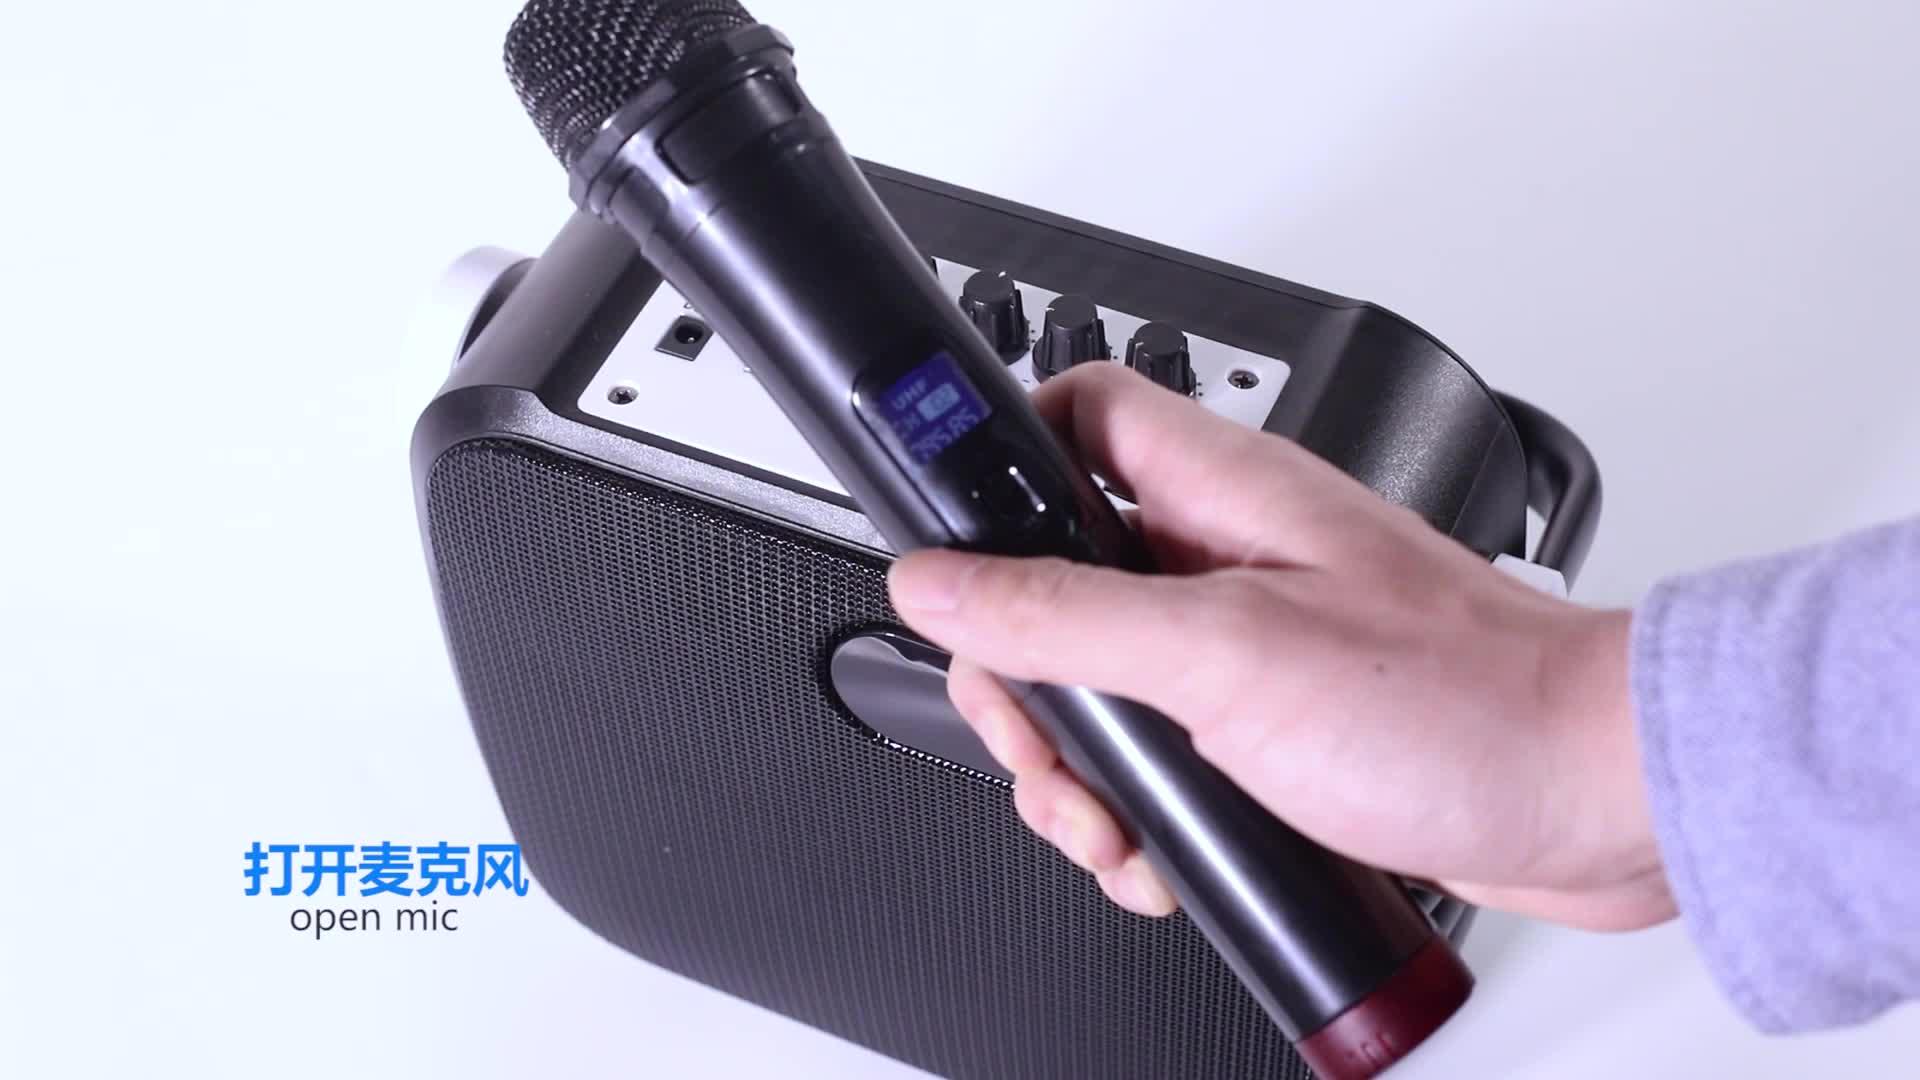 Micrófono portátil Pa de voz inalámbrico amplificador Karaoke